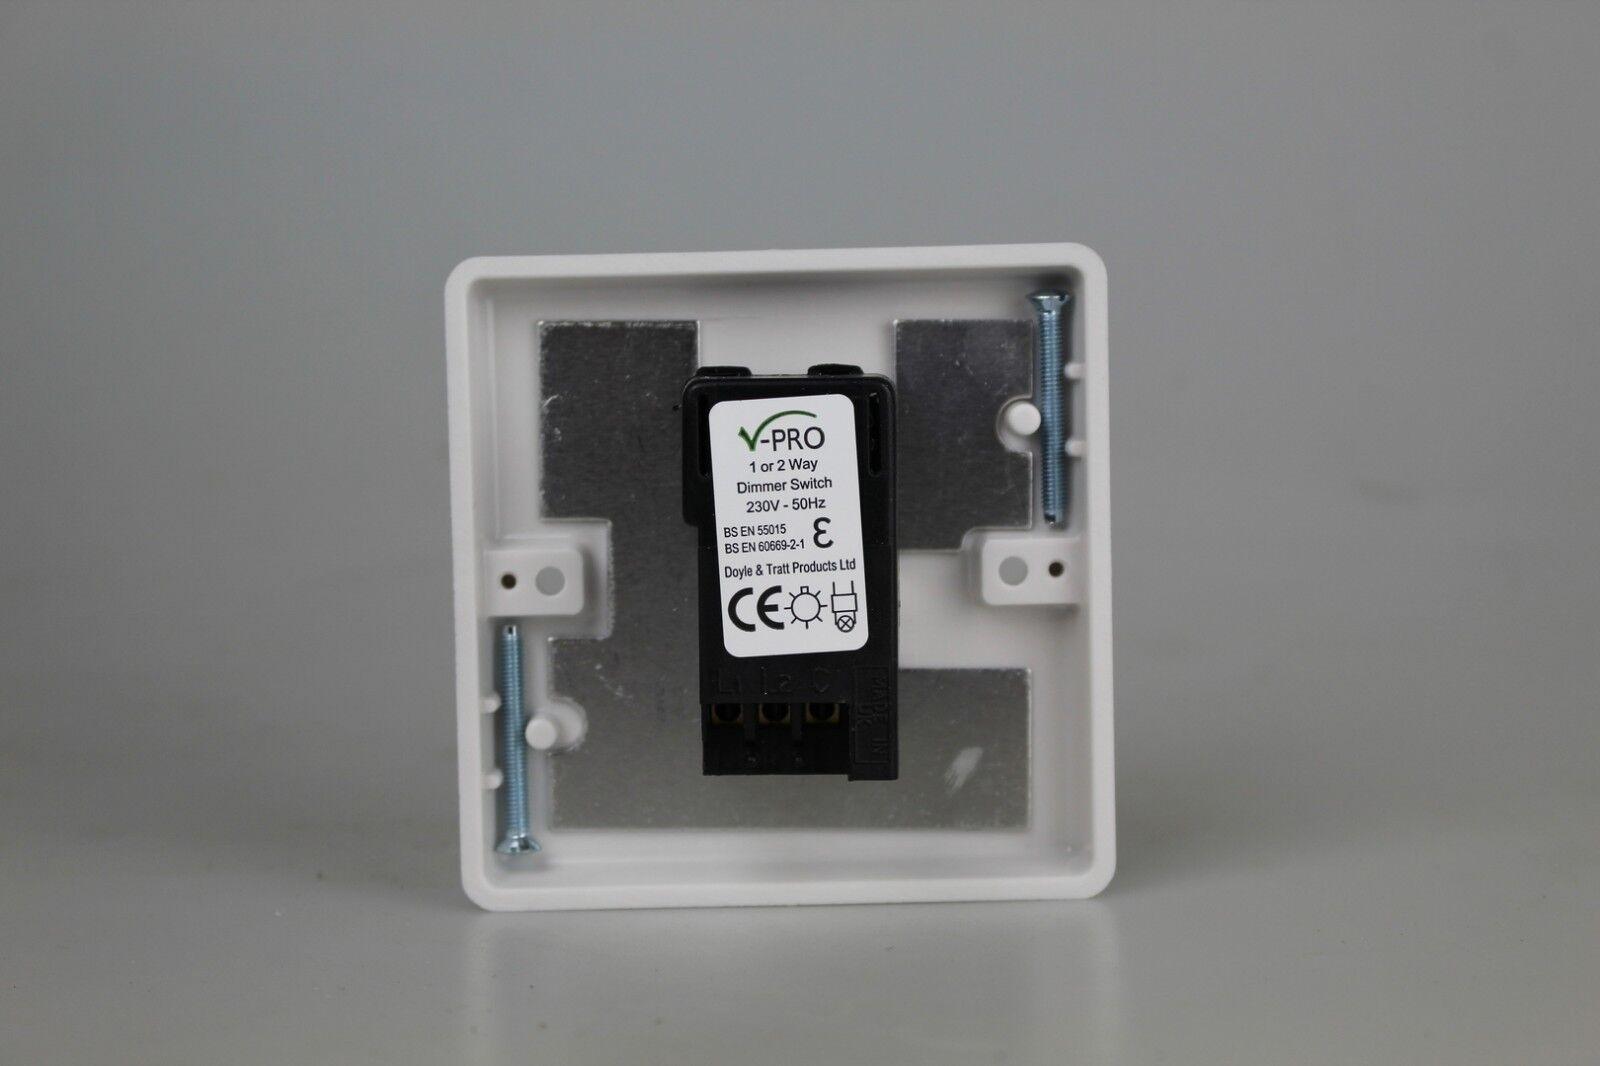 Varilight Jqp401w V Pro 1 Gang 2 Way Led Trailing Edge Dimmer Switch Wiring Instructions White Ebay